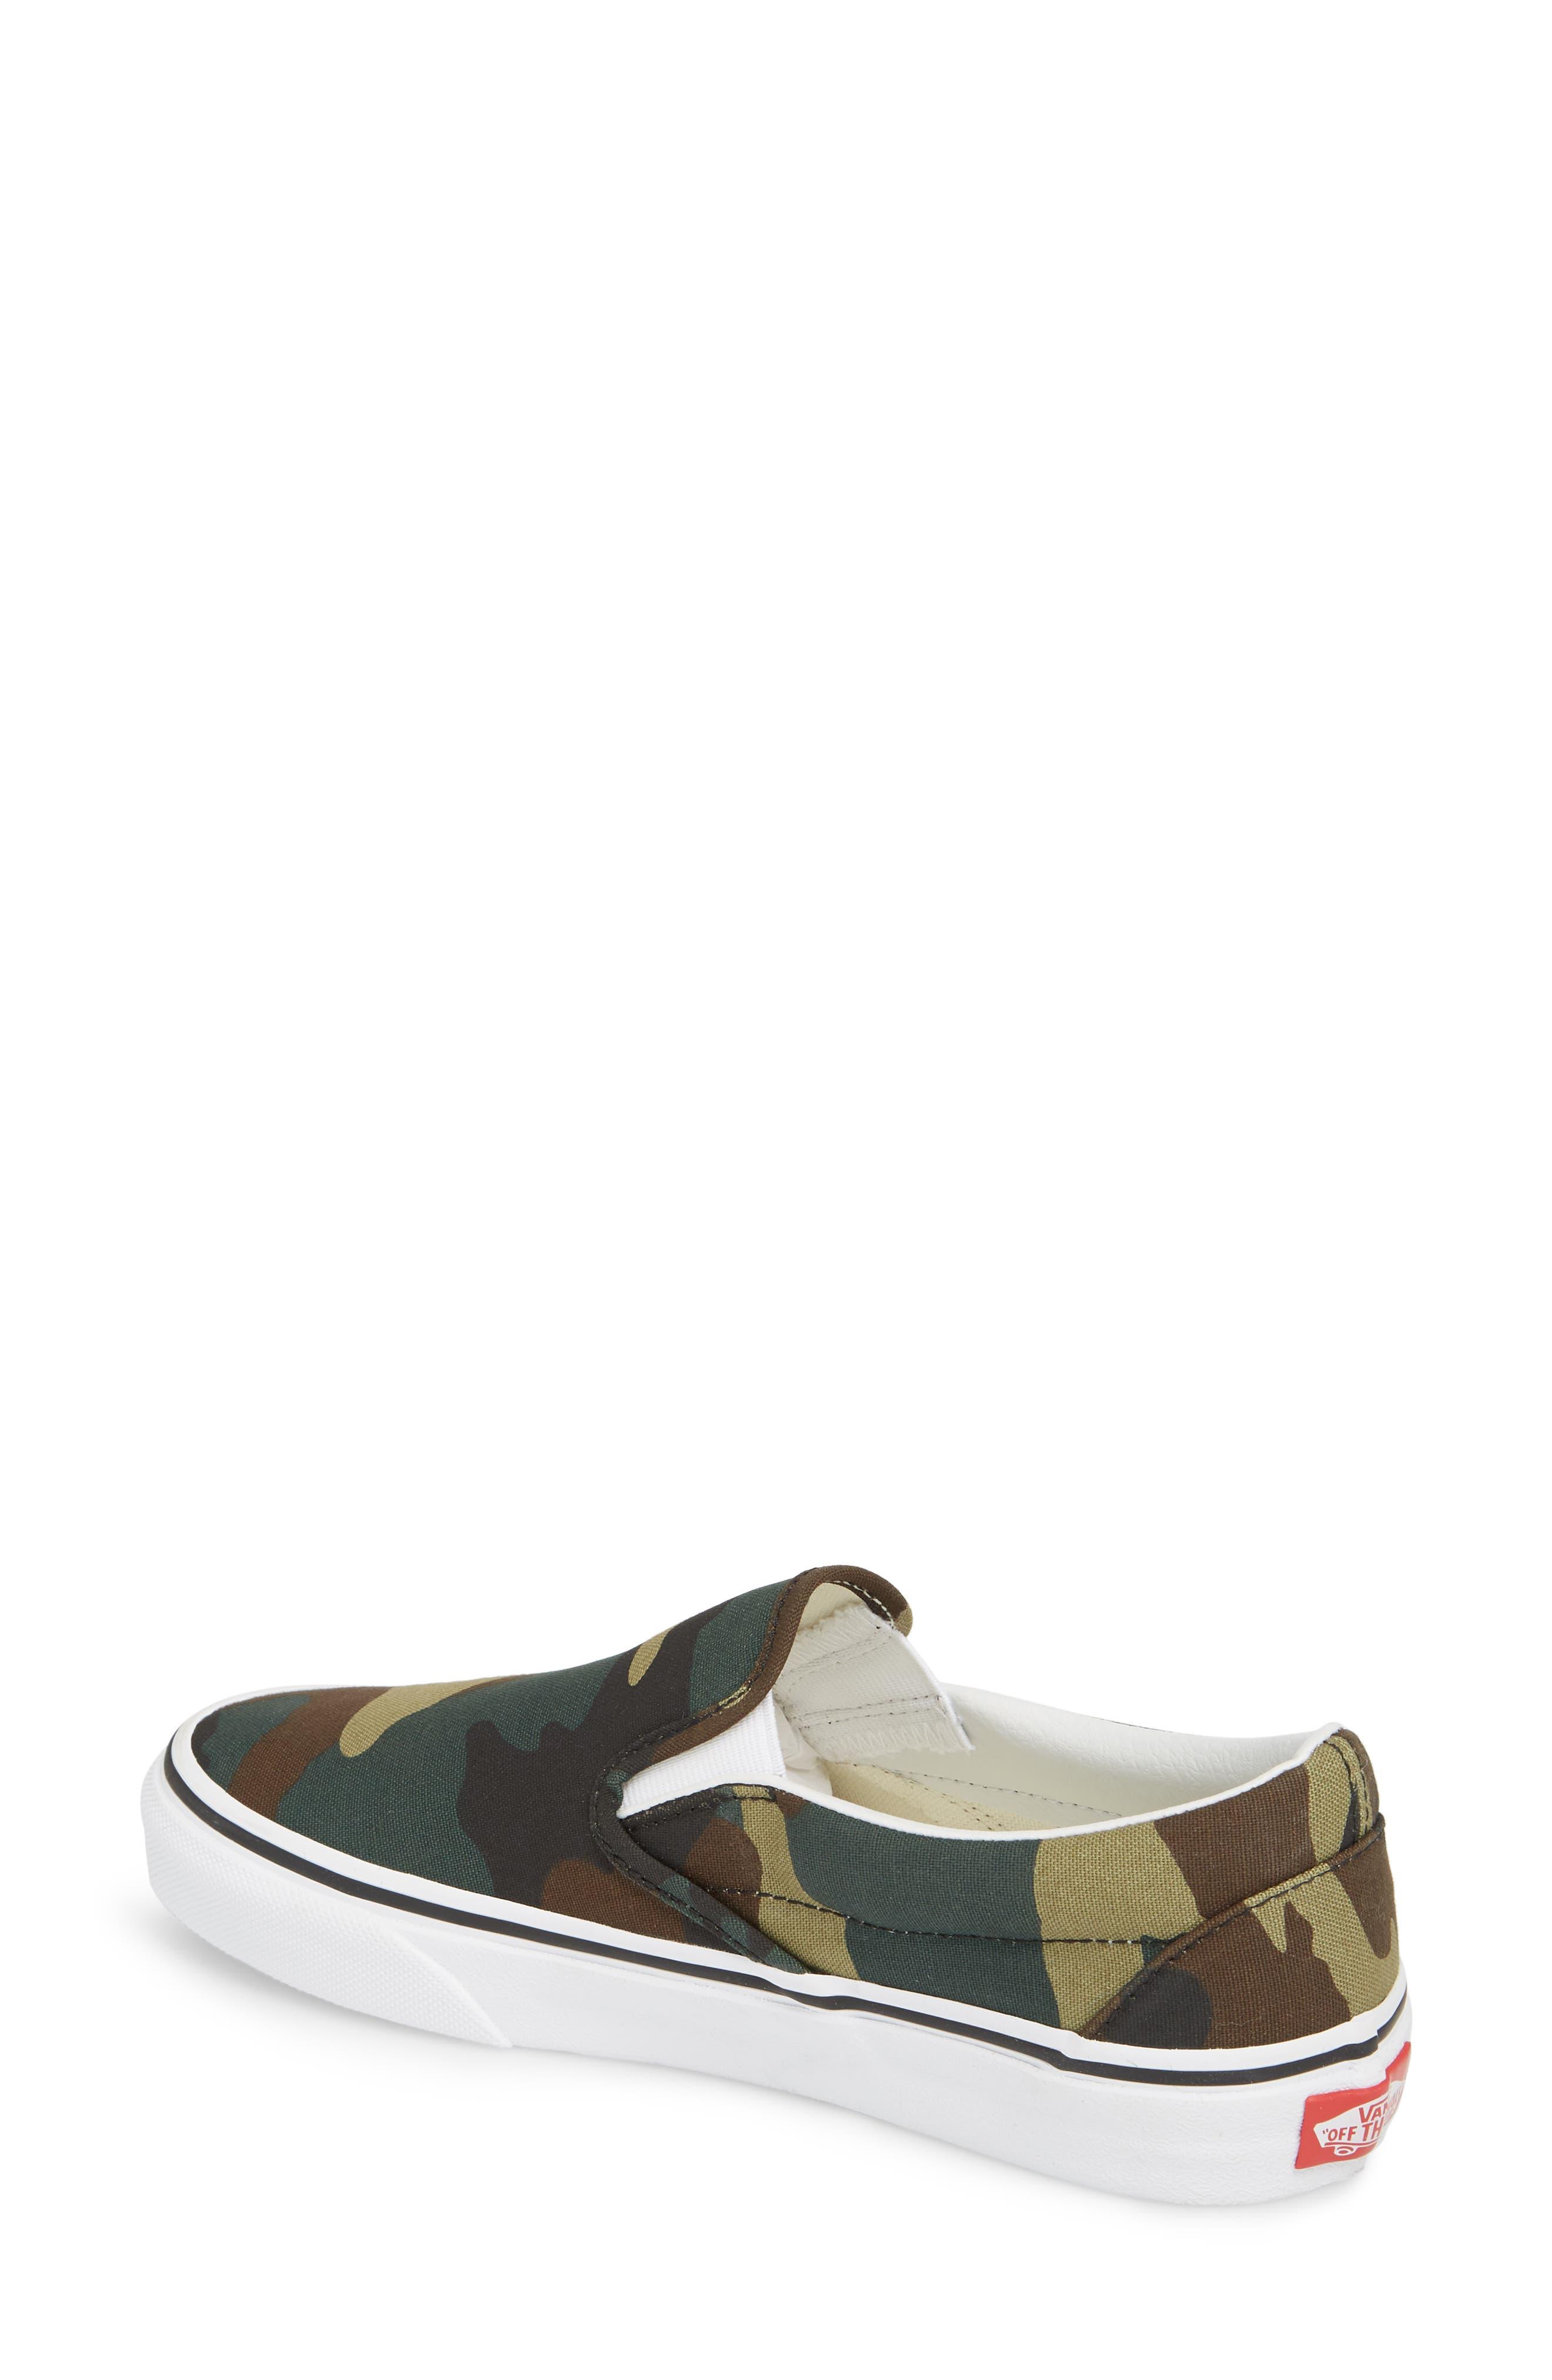 1e5a8369d95 Women s Sneakers   Running Shoes